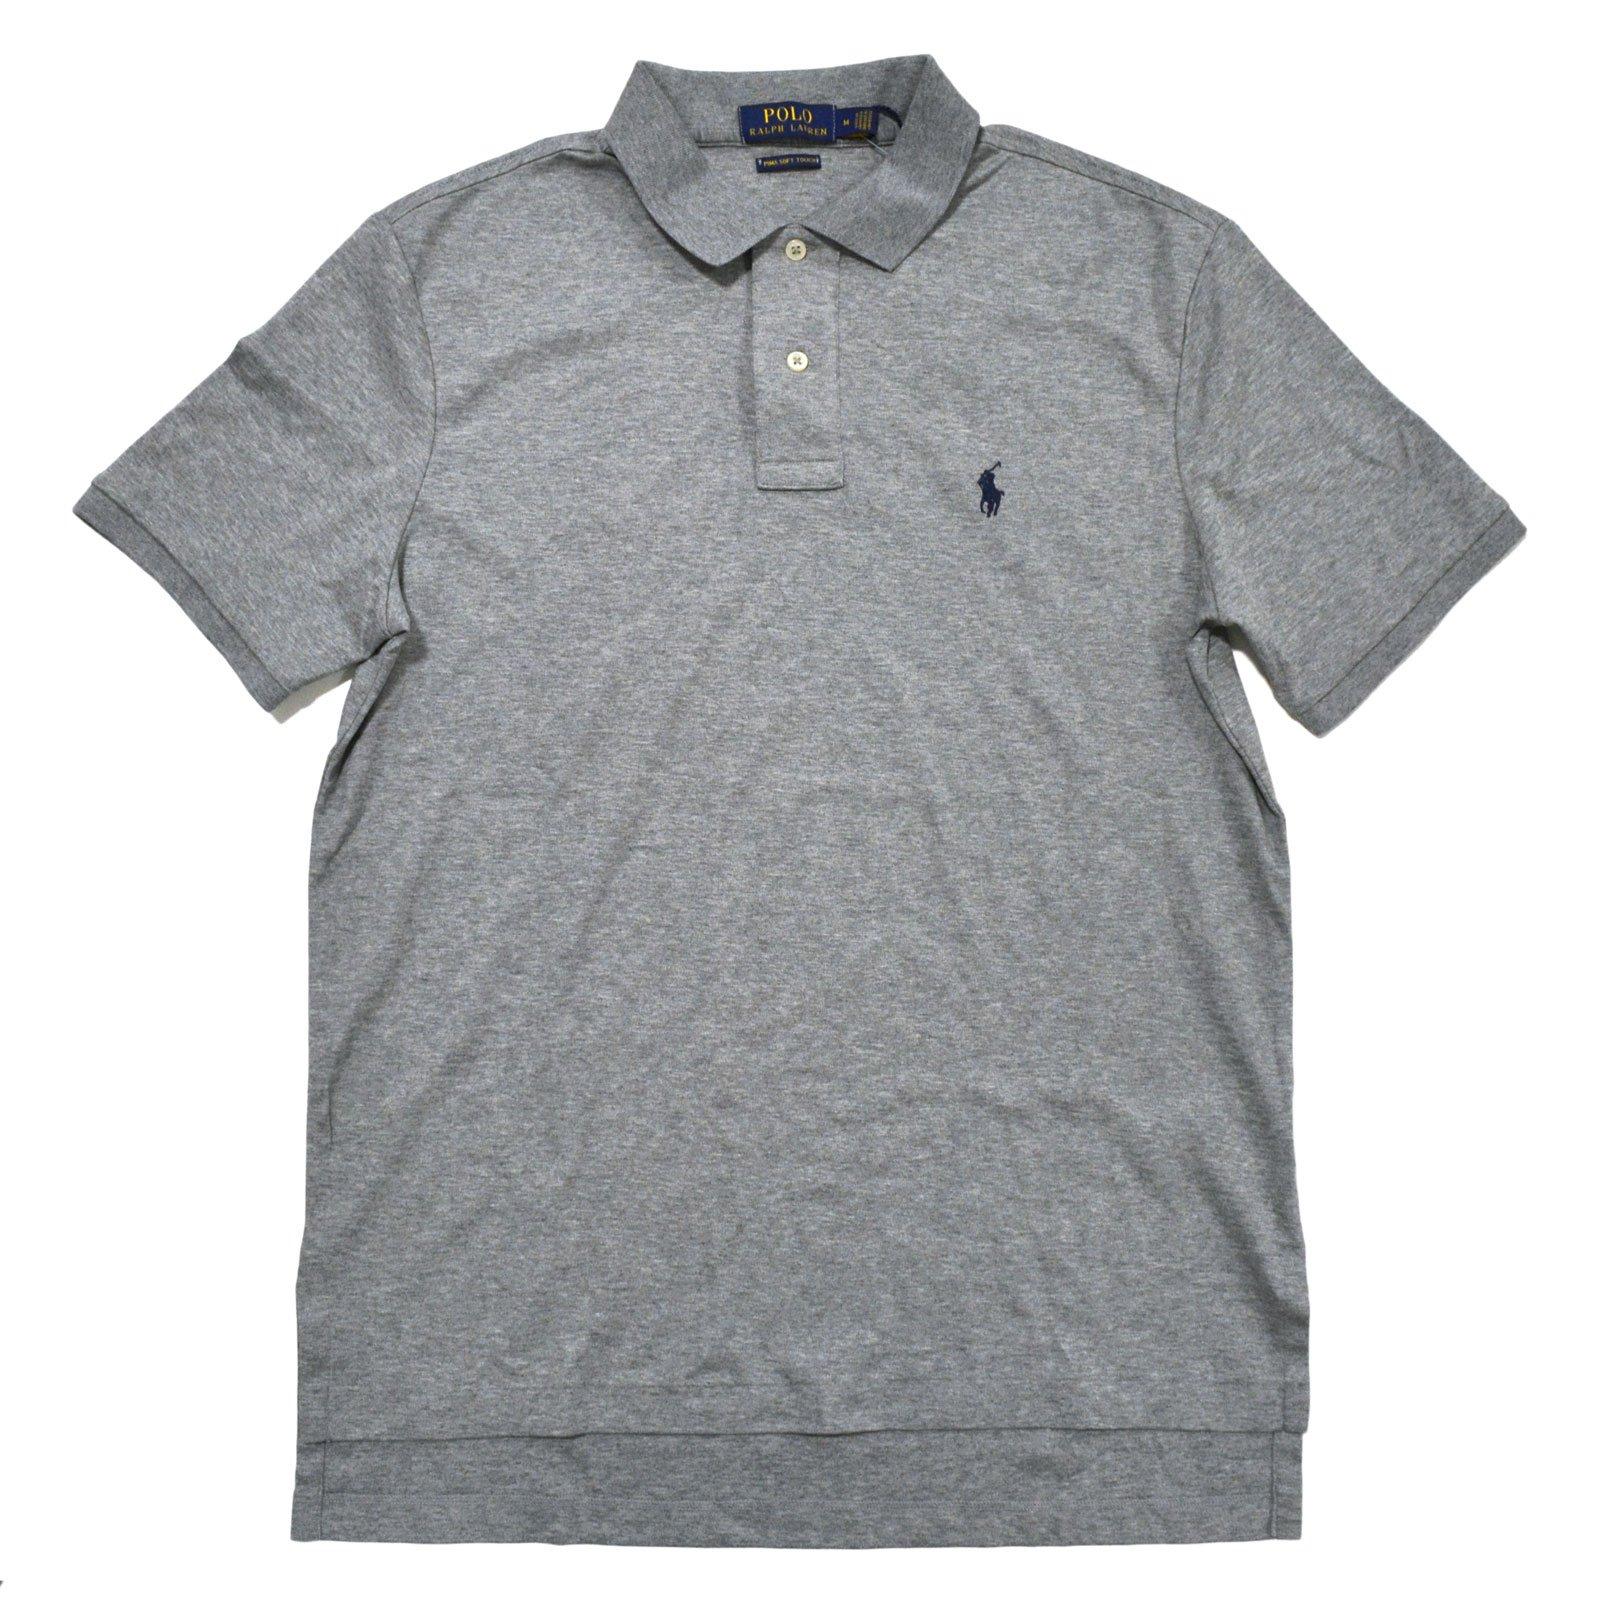 Polo Ralph Lauren Mens Pima Soft Touch Interlock Polo Shirt (XX-Large, Andover Heather Grey)